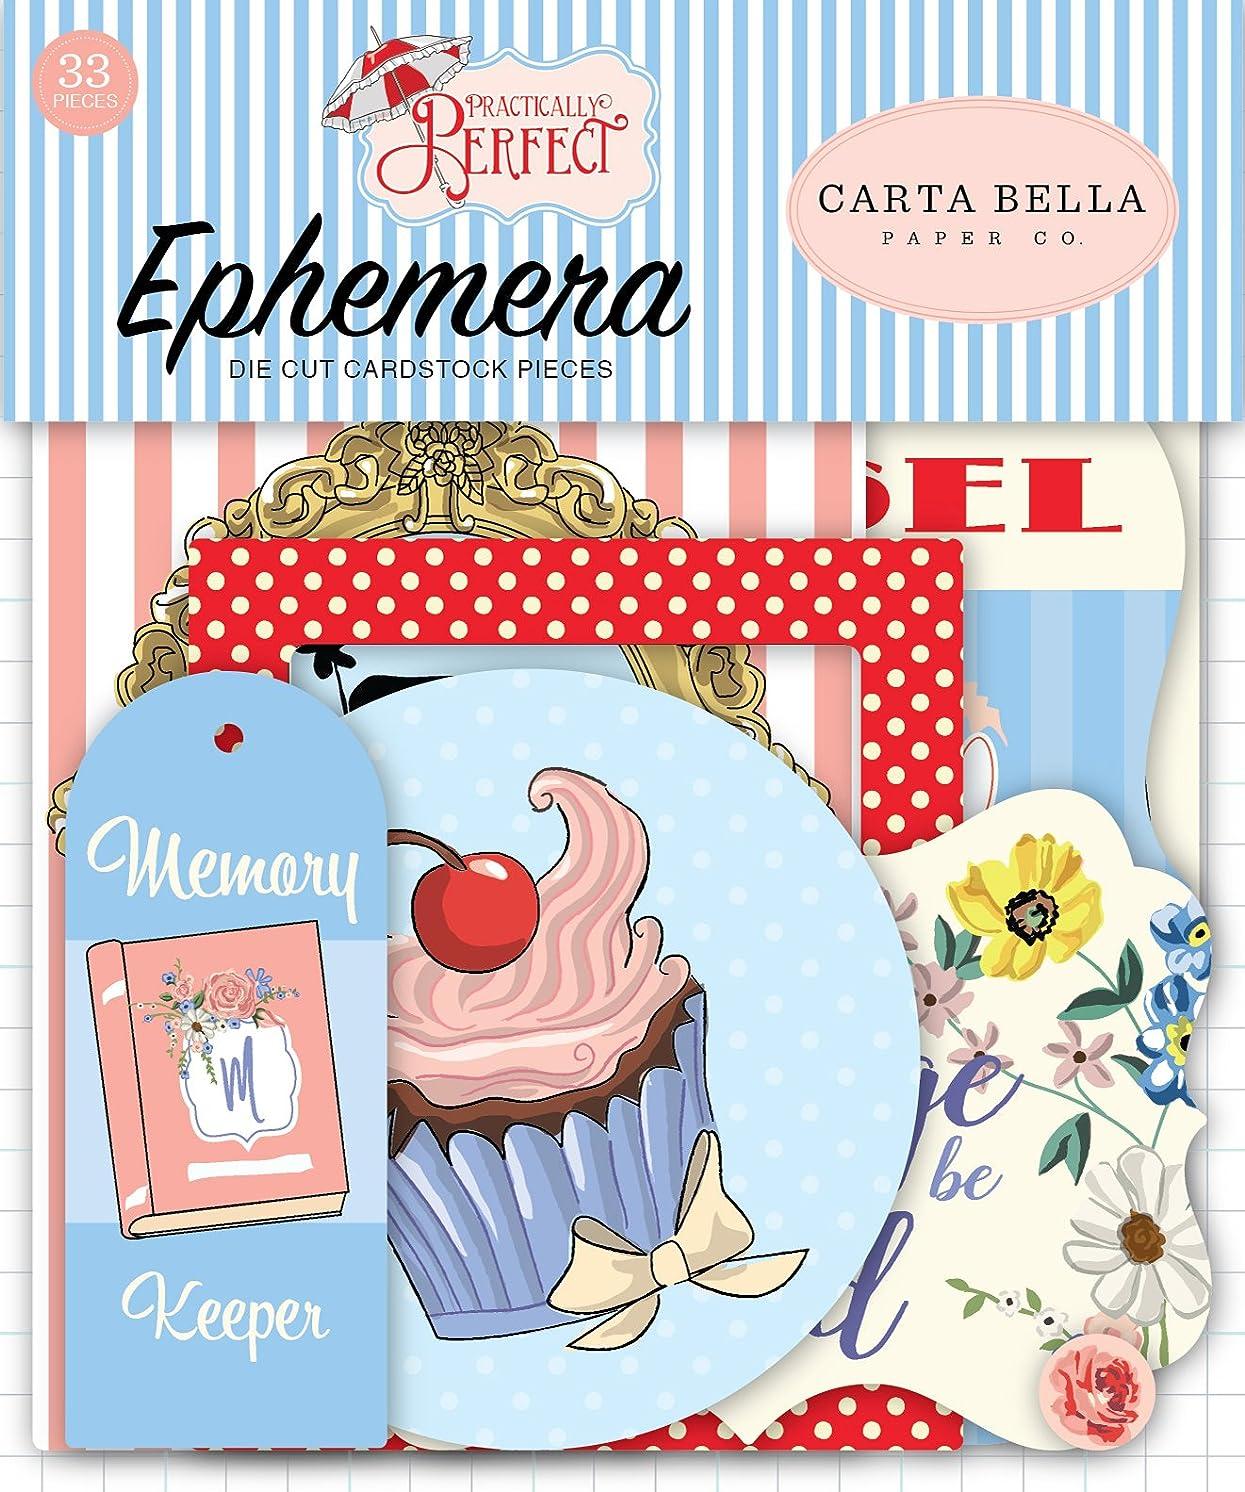 Carta Bella Paper Company Practically Perfect Ephemera